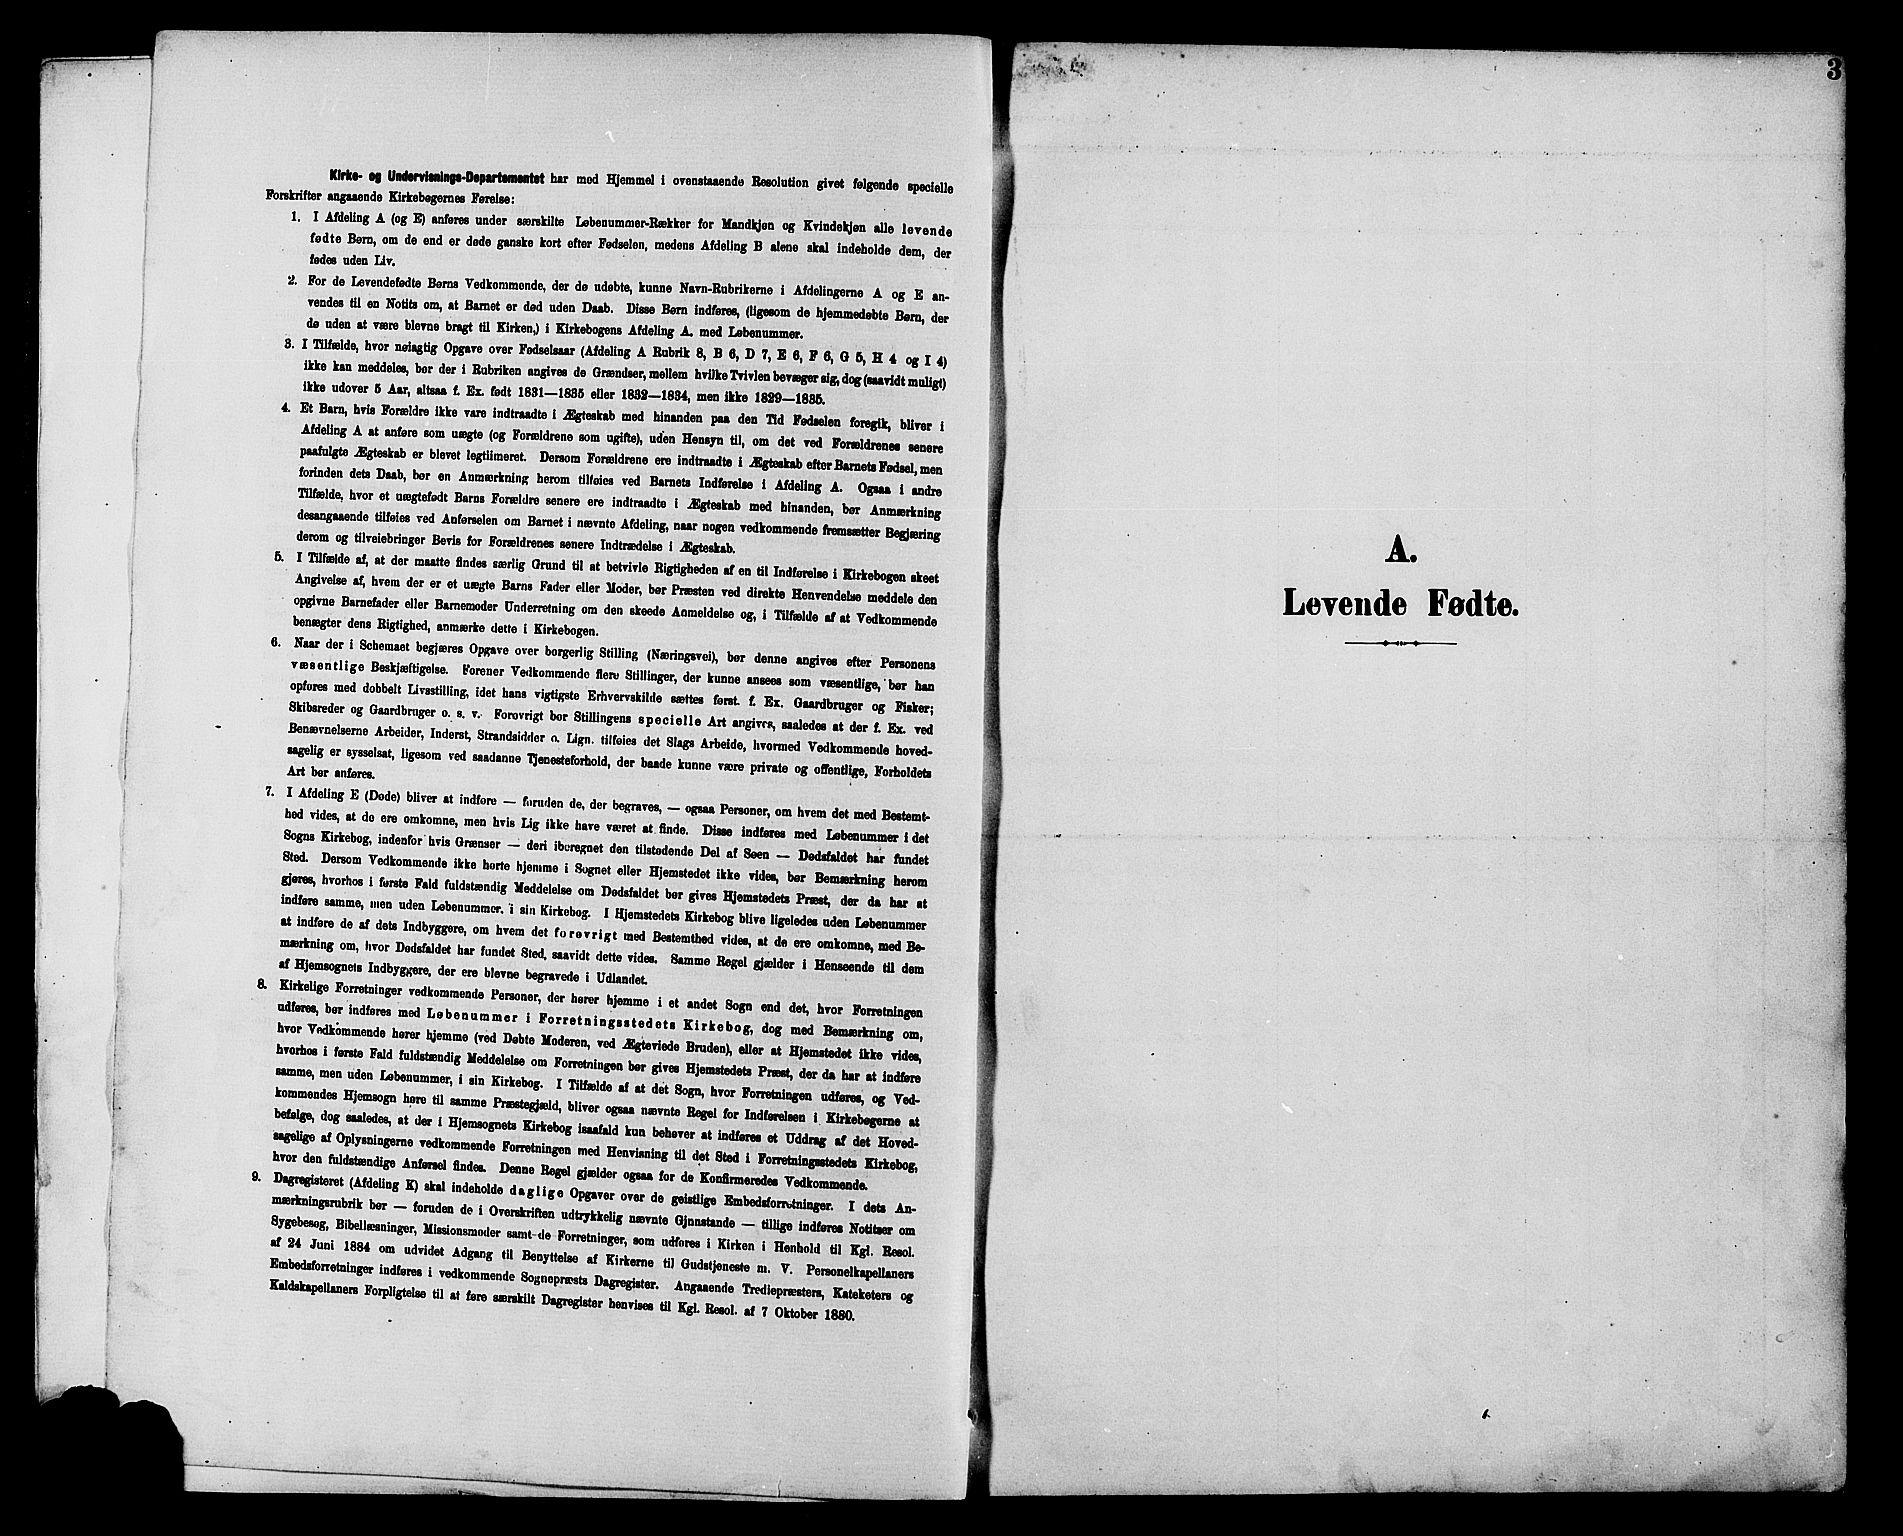 SAH, Vardal prestekontor, H/Ha/Hab/L0011: Klokkerbok nr. 11, 1899-1913, s. 3